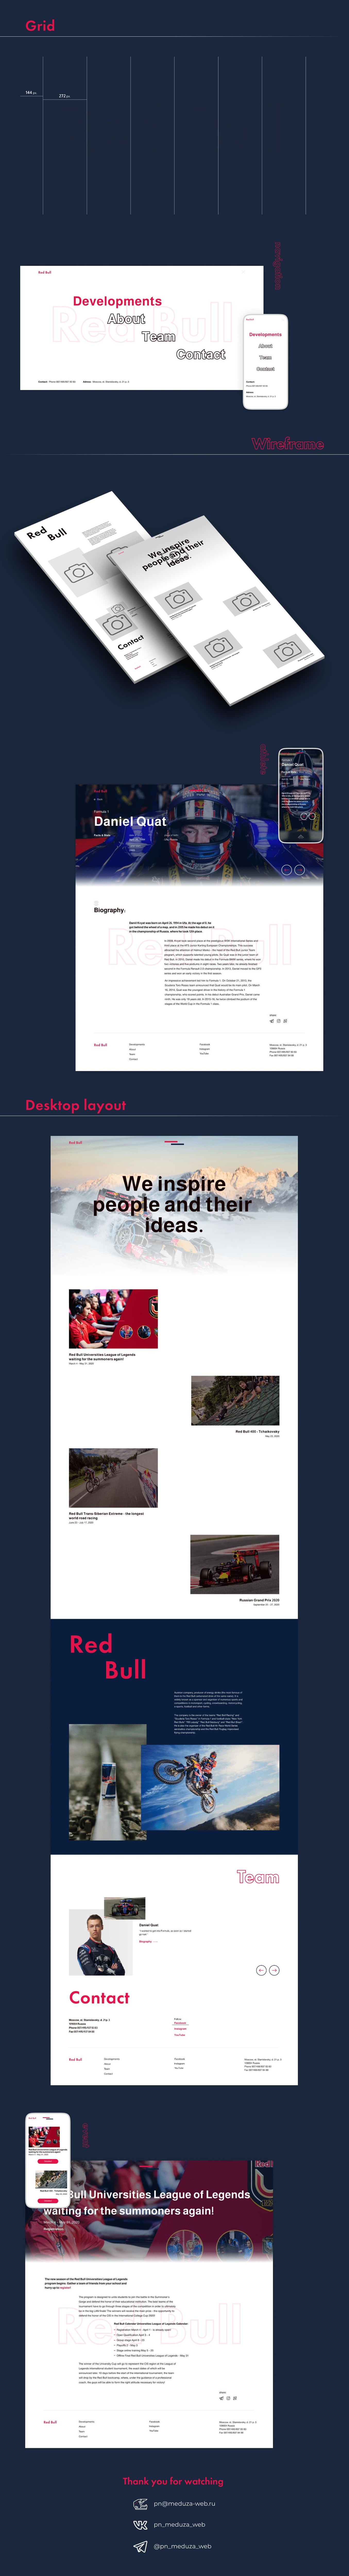 Behance interaface landing photoshop UI/UX Webdesign Website дизайн